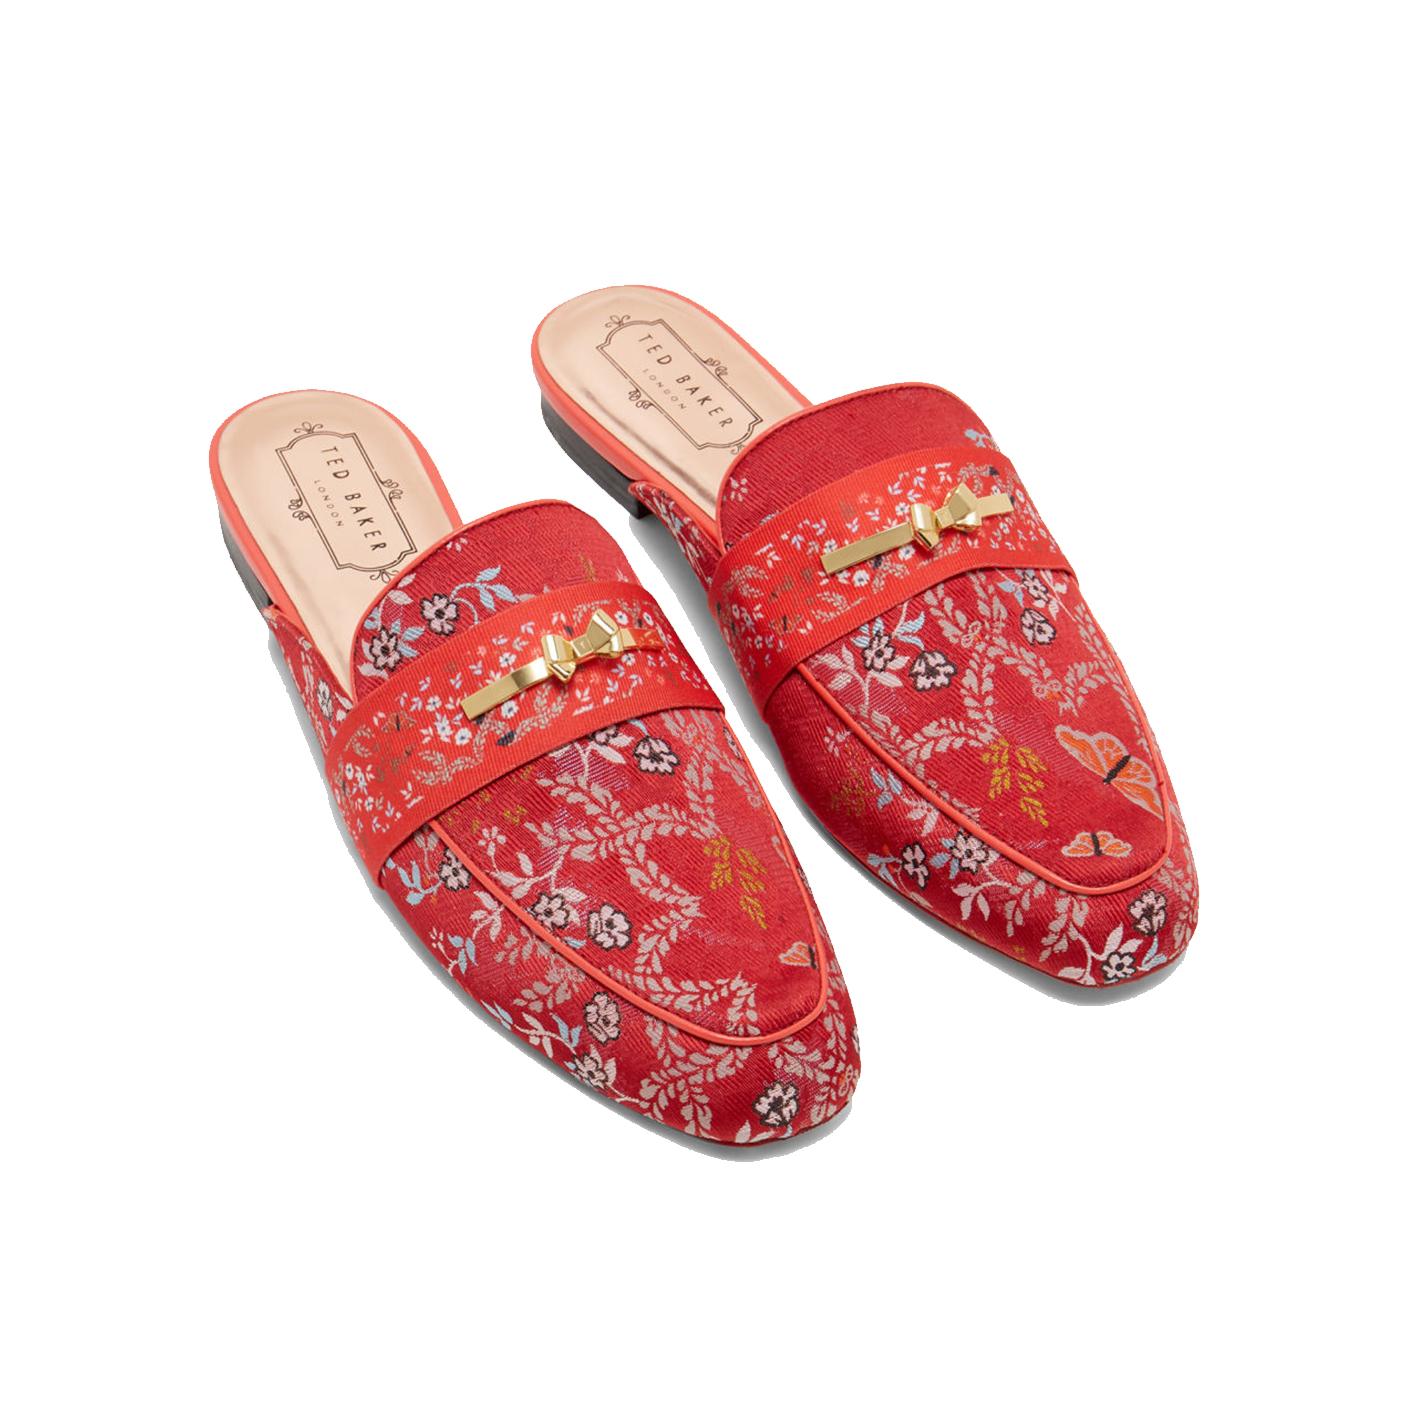 Kyoto Gardens Slip On Loafers, £78, Ted Baker